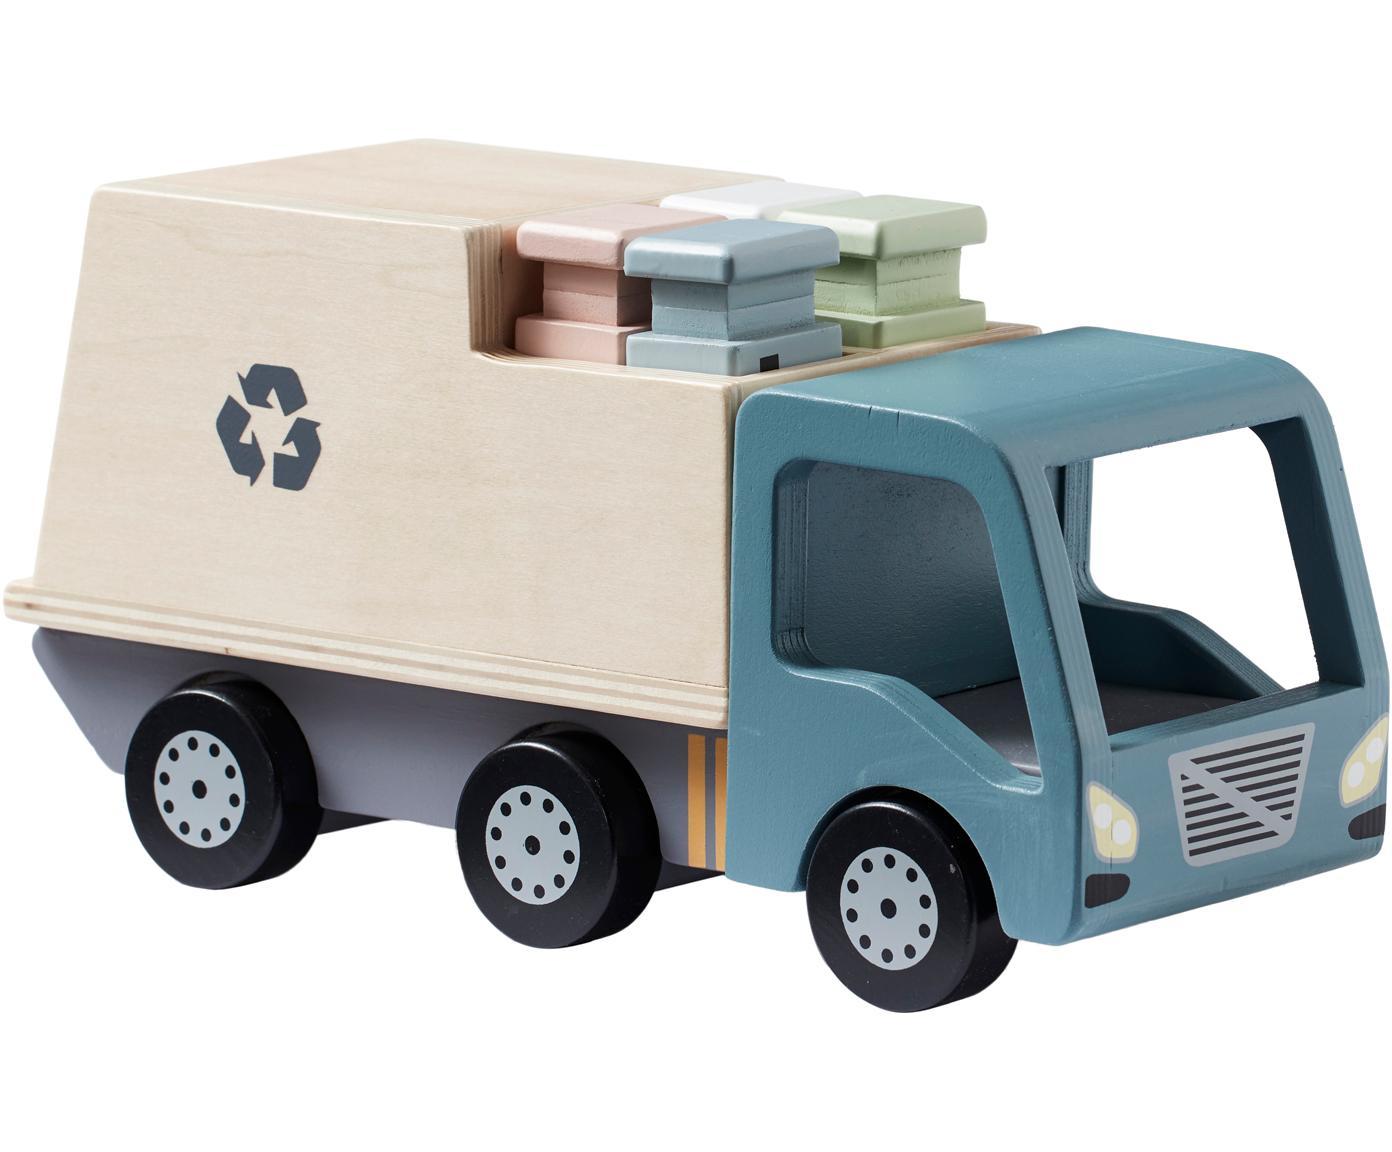 Spielzeug Aiden, Holz, Mehrfarbig, 10 x 14 cm